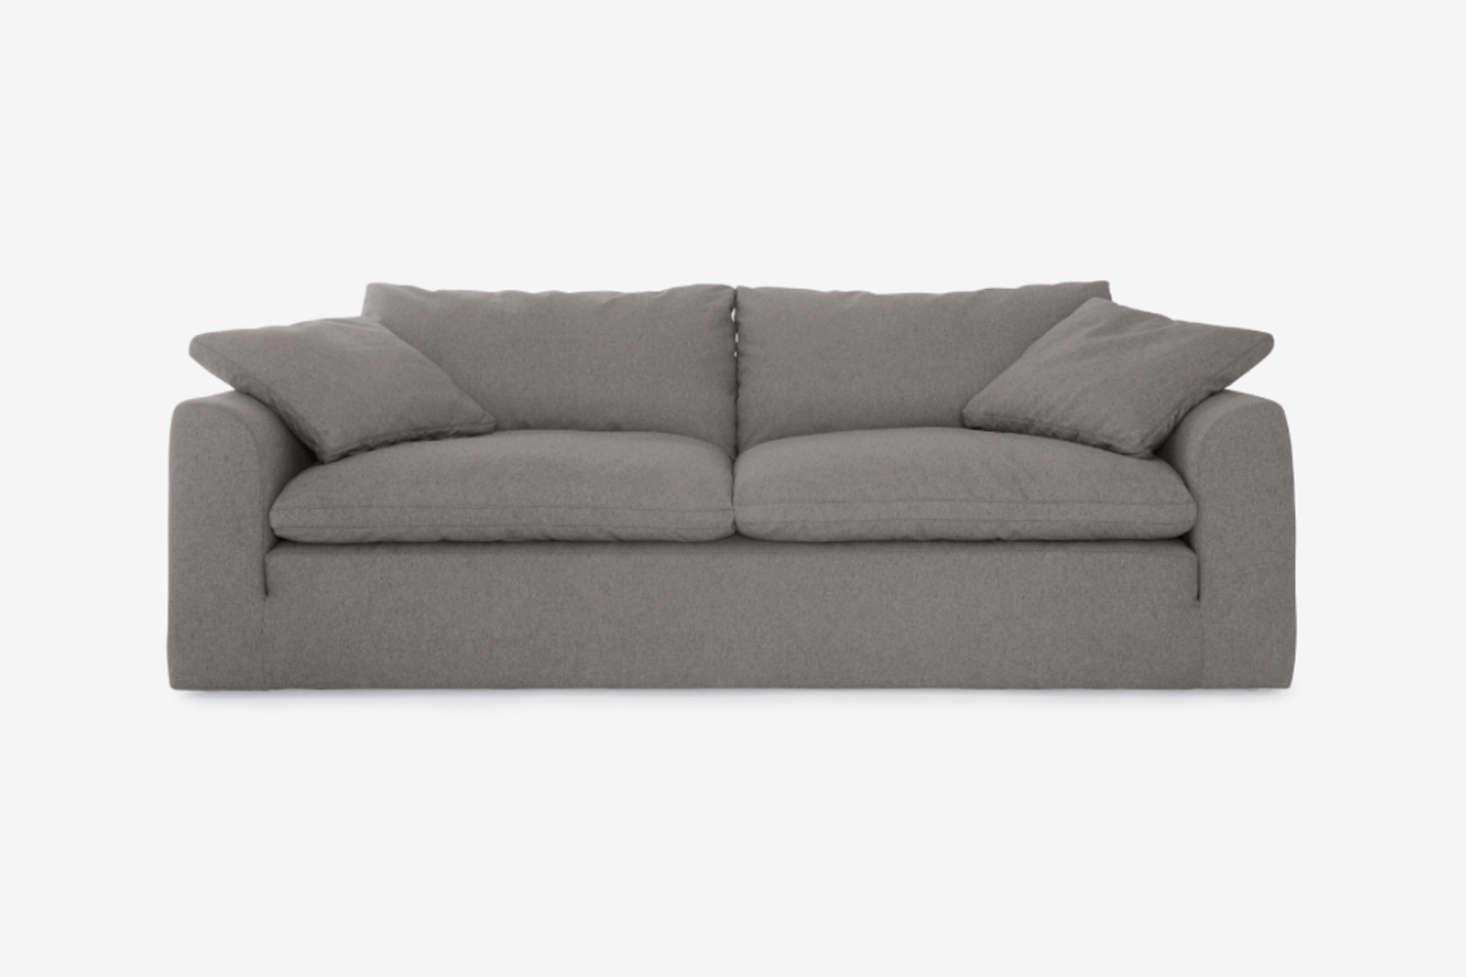 sofa set below 3000 in hyderabad bunk bed convertible 10 easy pieces 39first sofas 39 under 3 000 remodelista